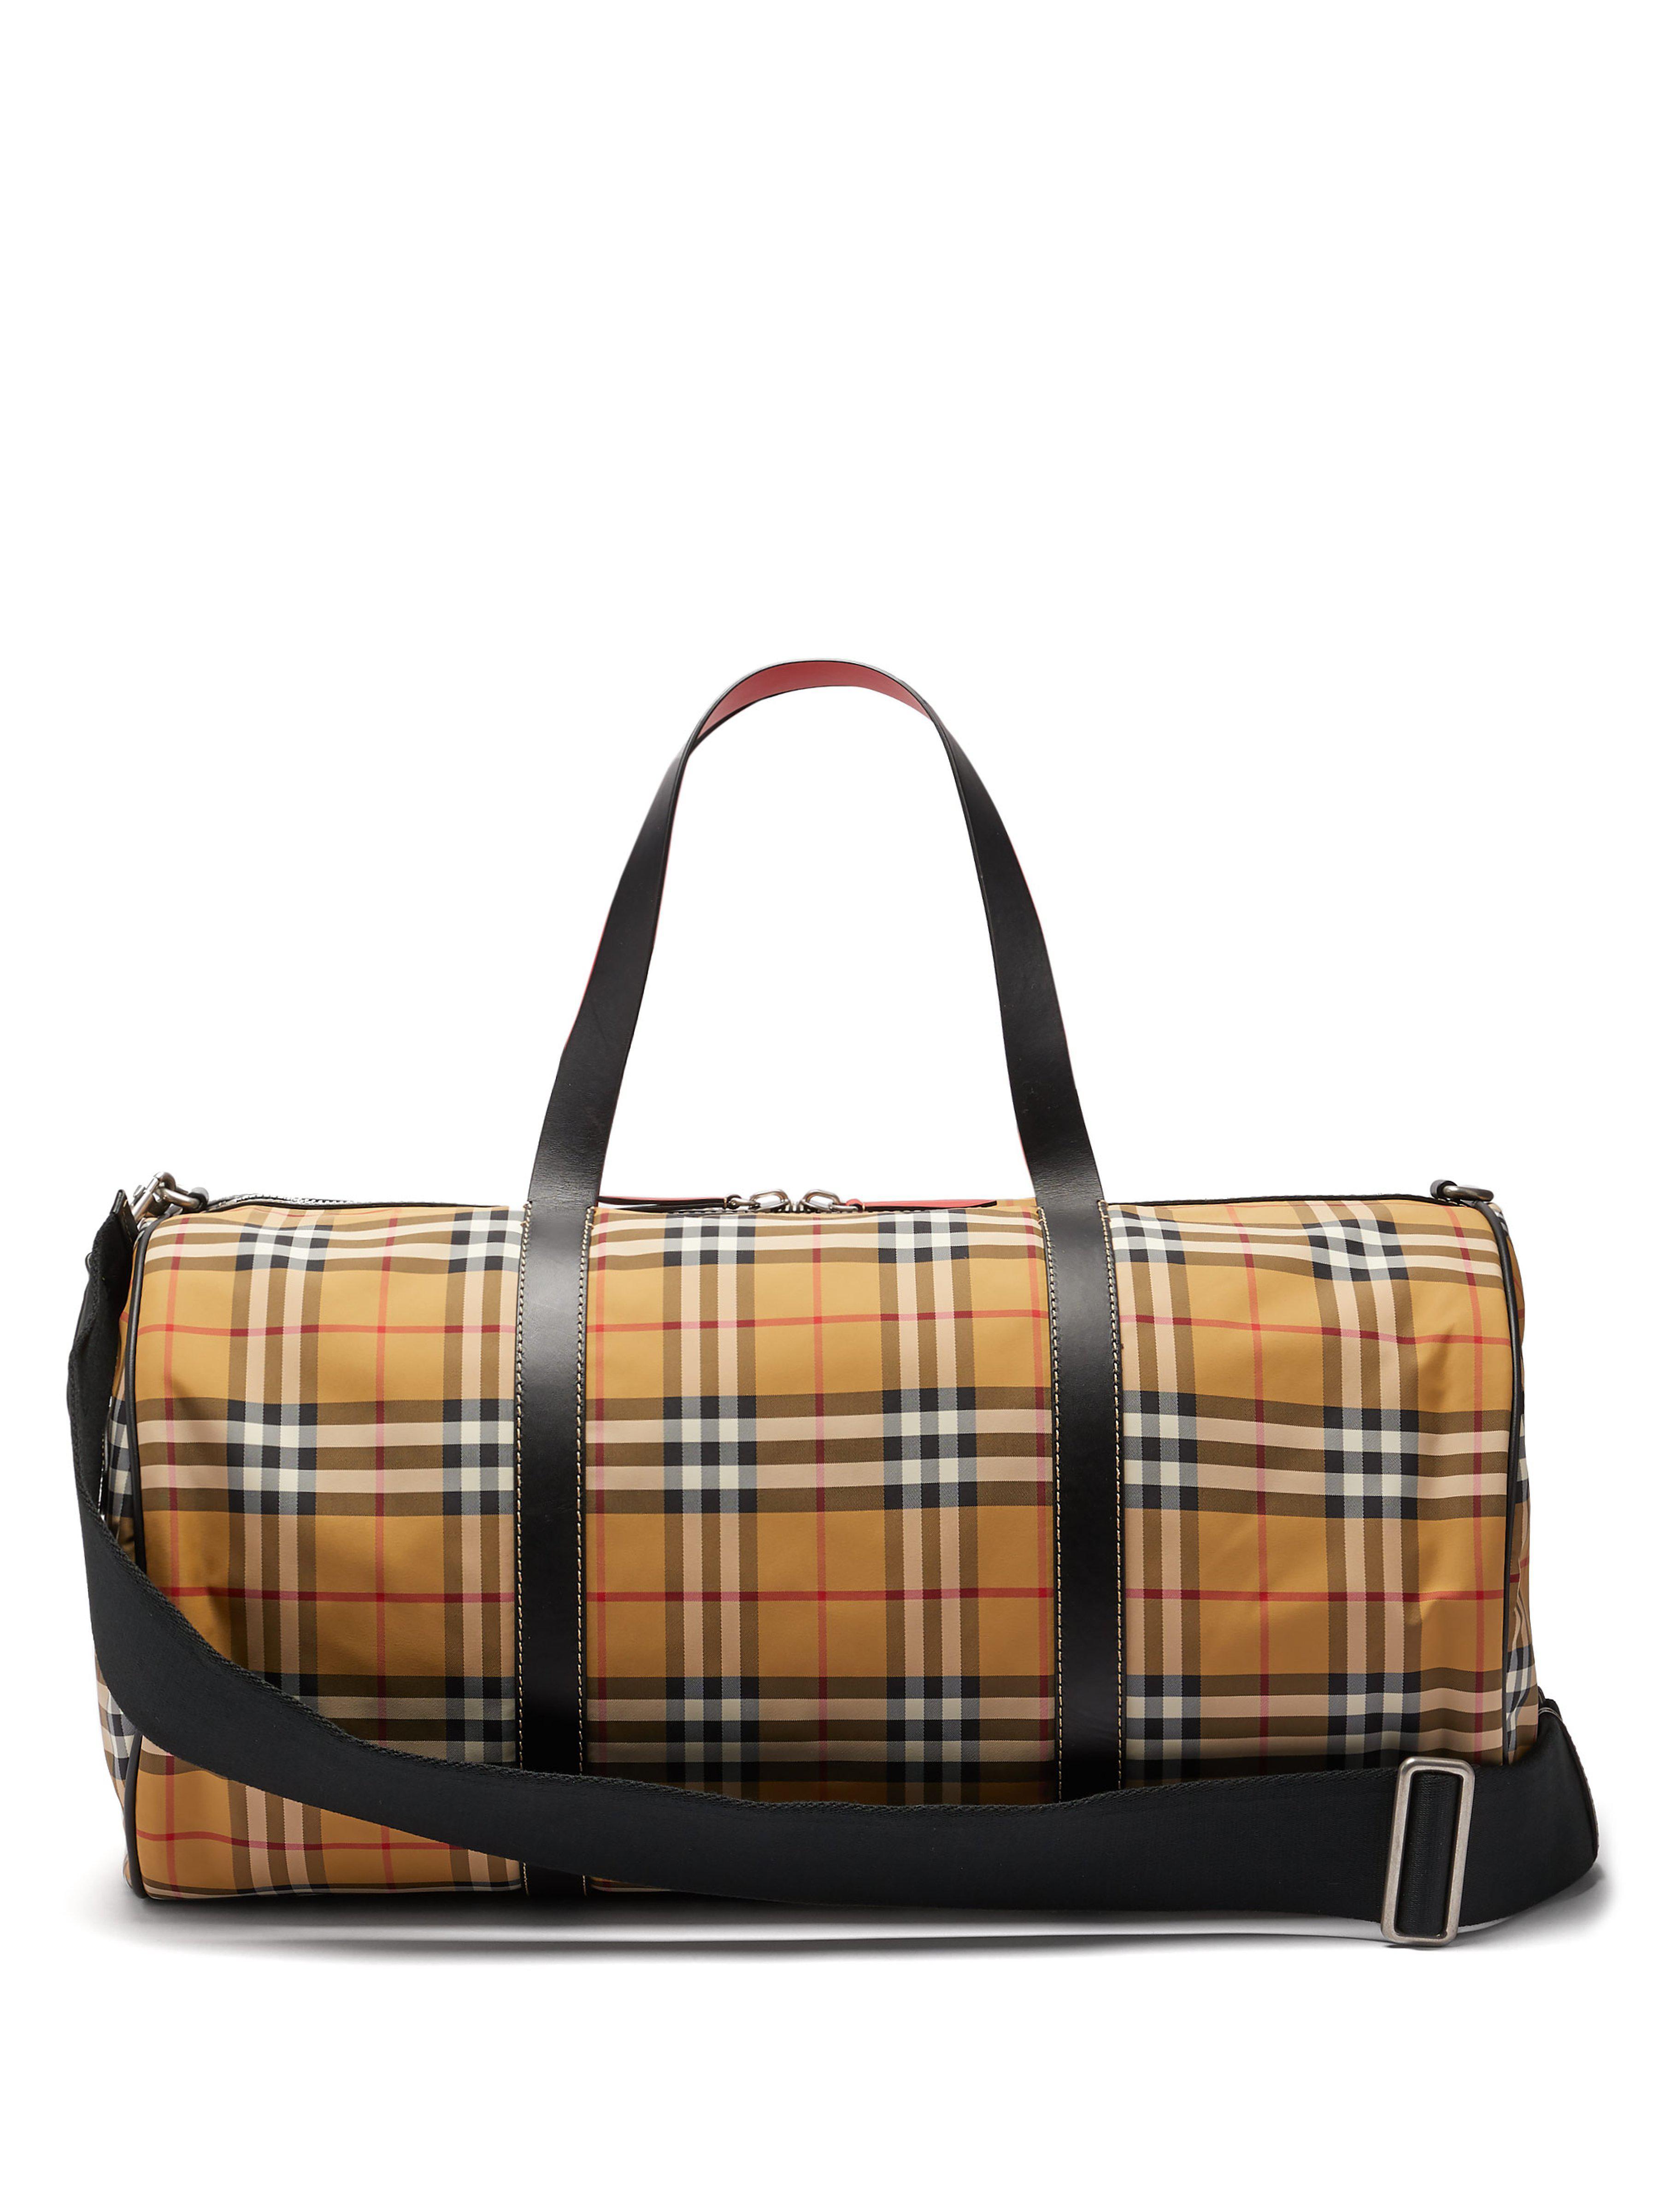 Burberry Kennedy Vintage Check Weekend Bag in Brown - Lyst 64c79db3abd09